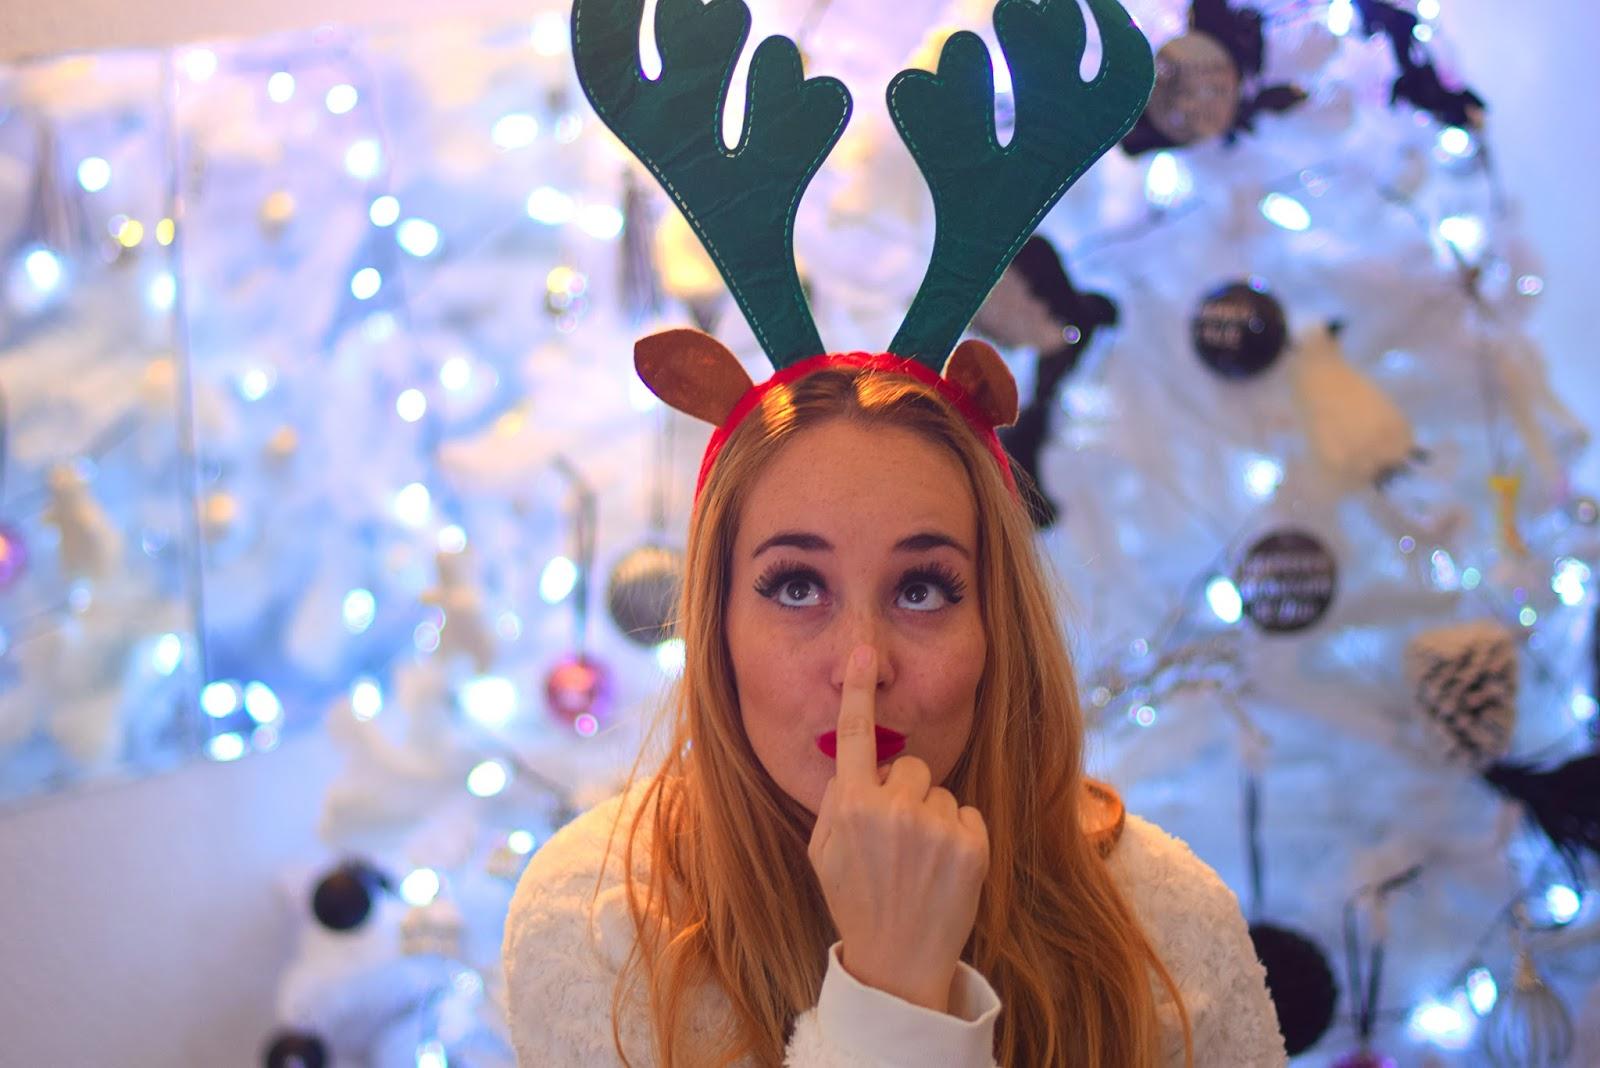 nery hdez, feliz navidad, navidad , christmas day, merry christmas